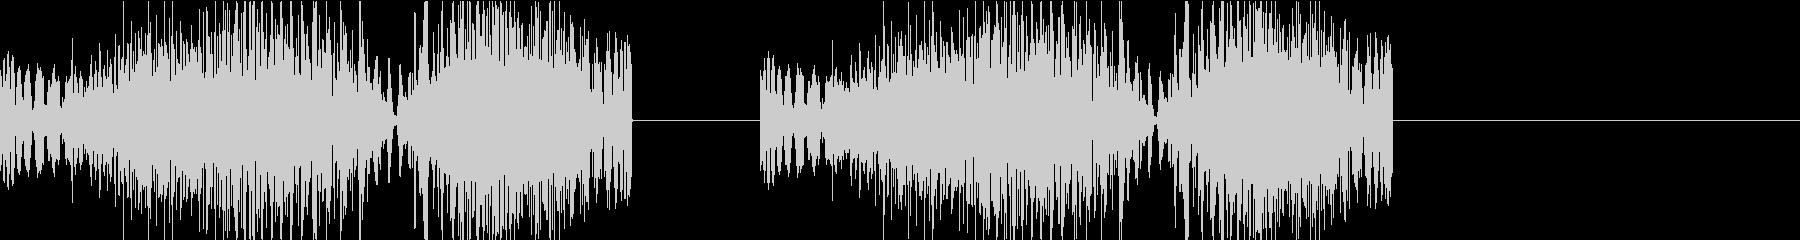 DJプレイ スクラッチ・ノイズ 317の未再生の波形